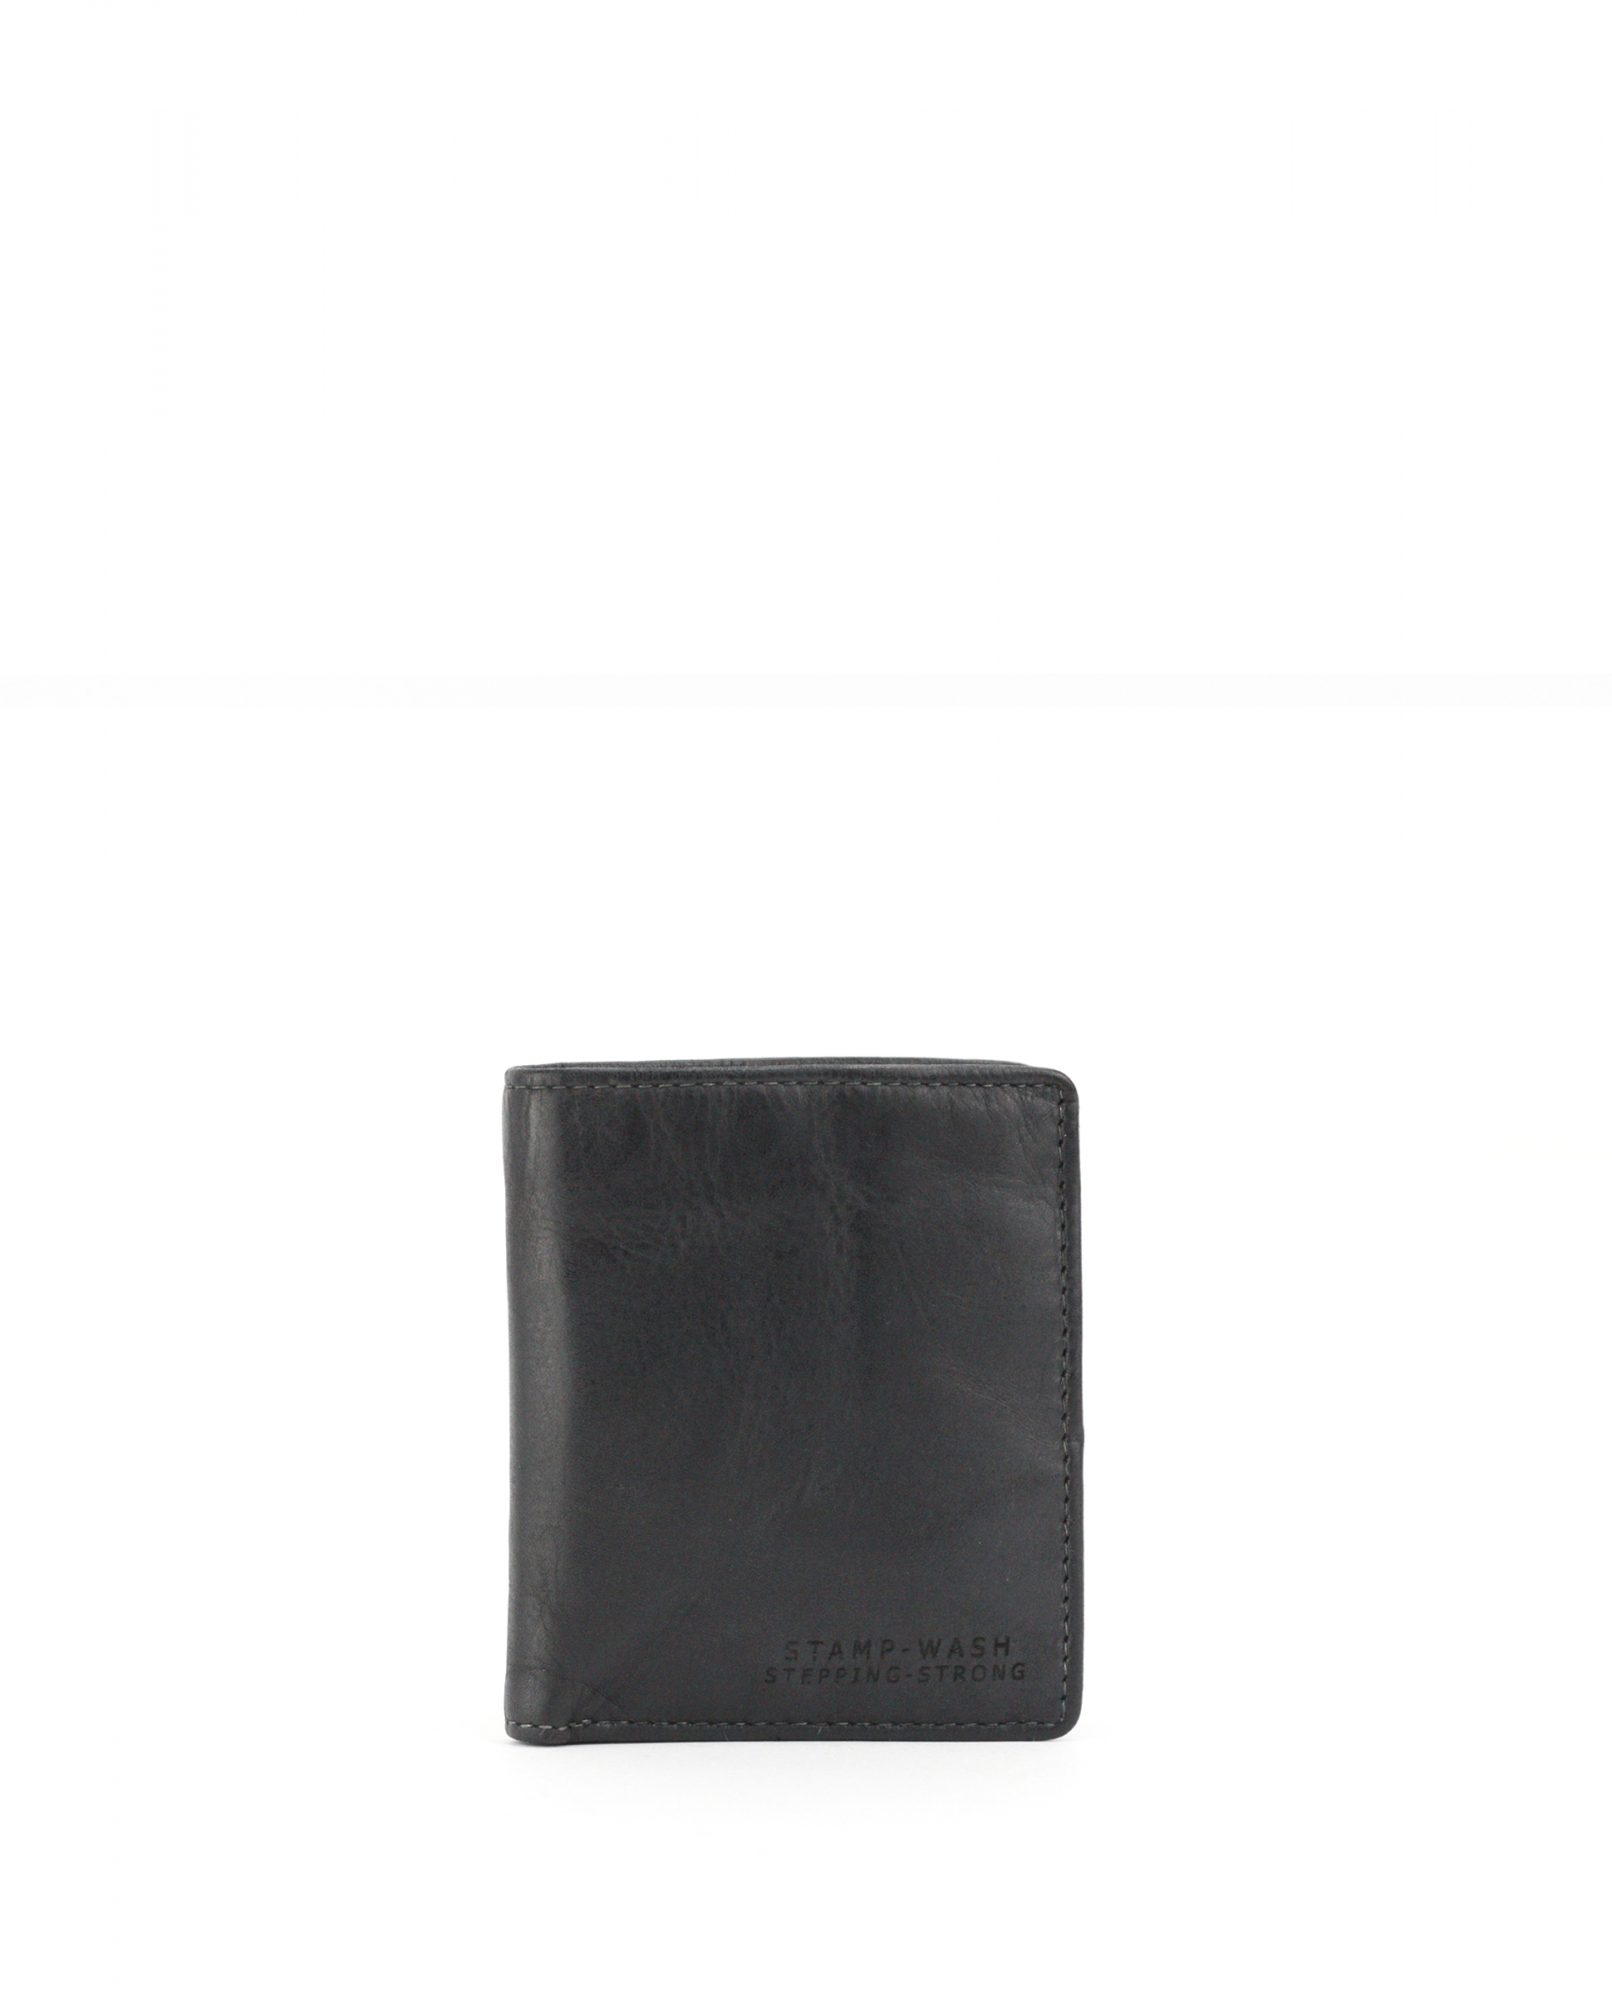 TICHI-Billetero de piel Stamp color negro-MHST11928NE-STAMP